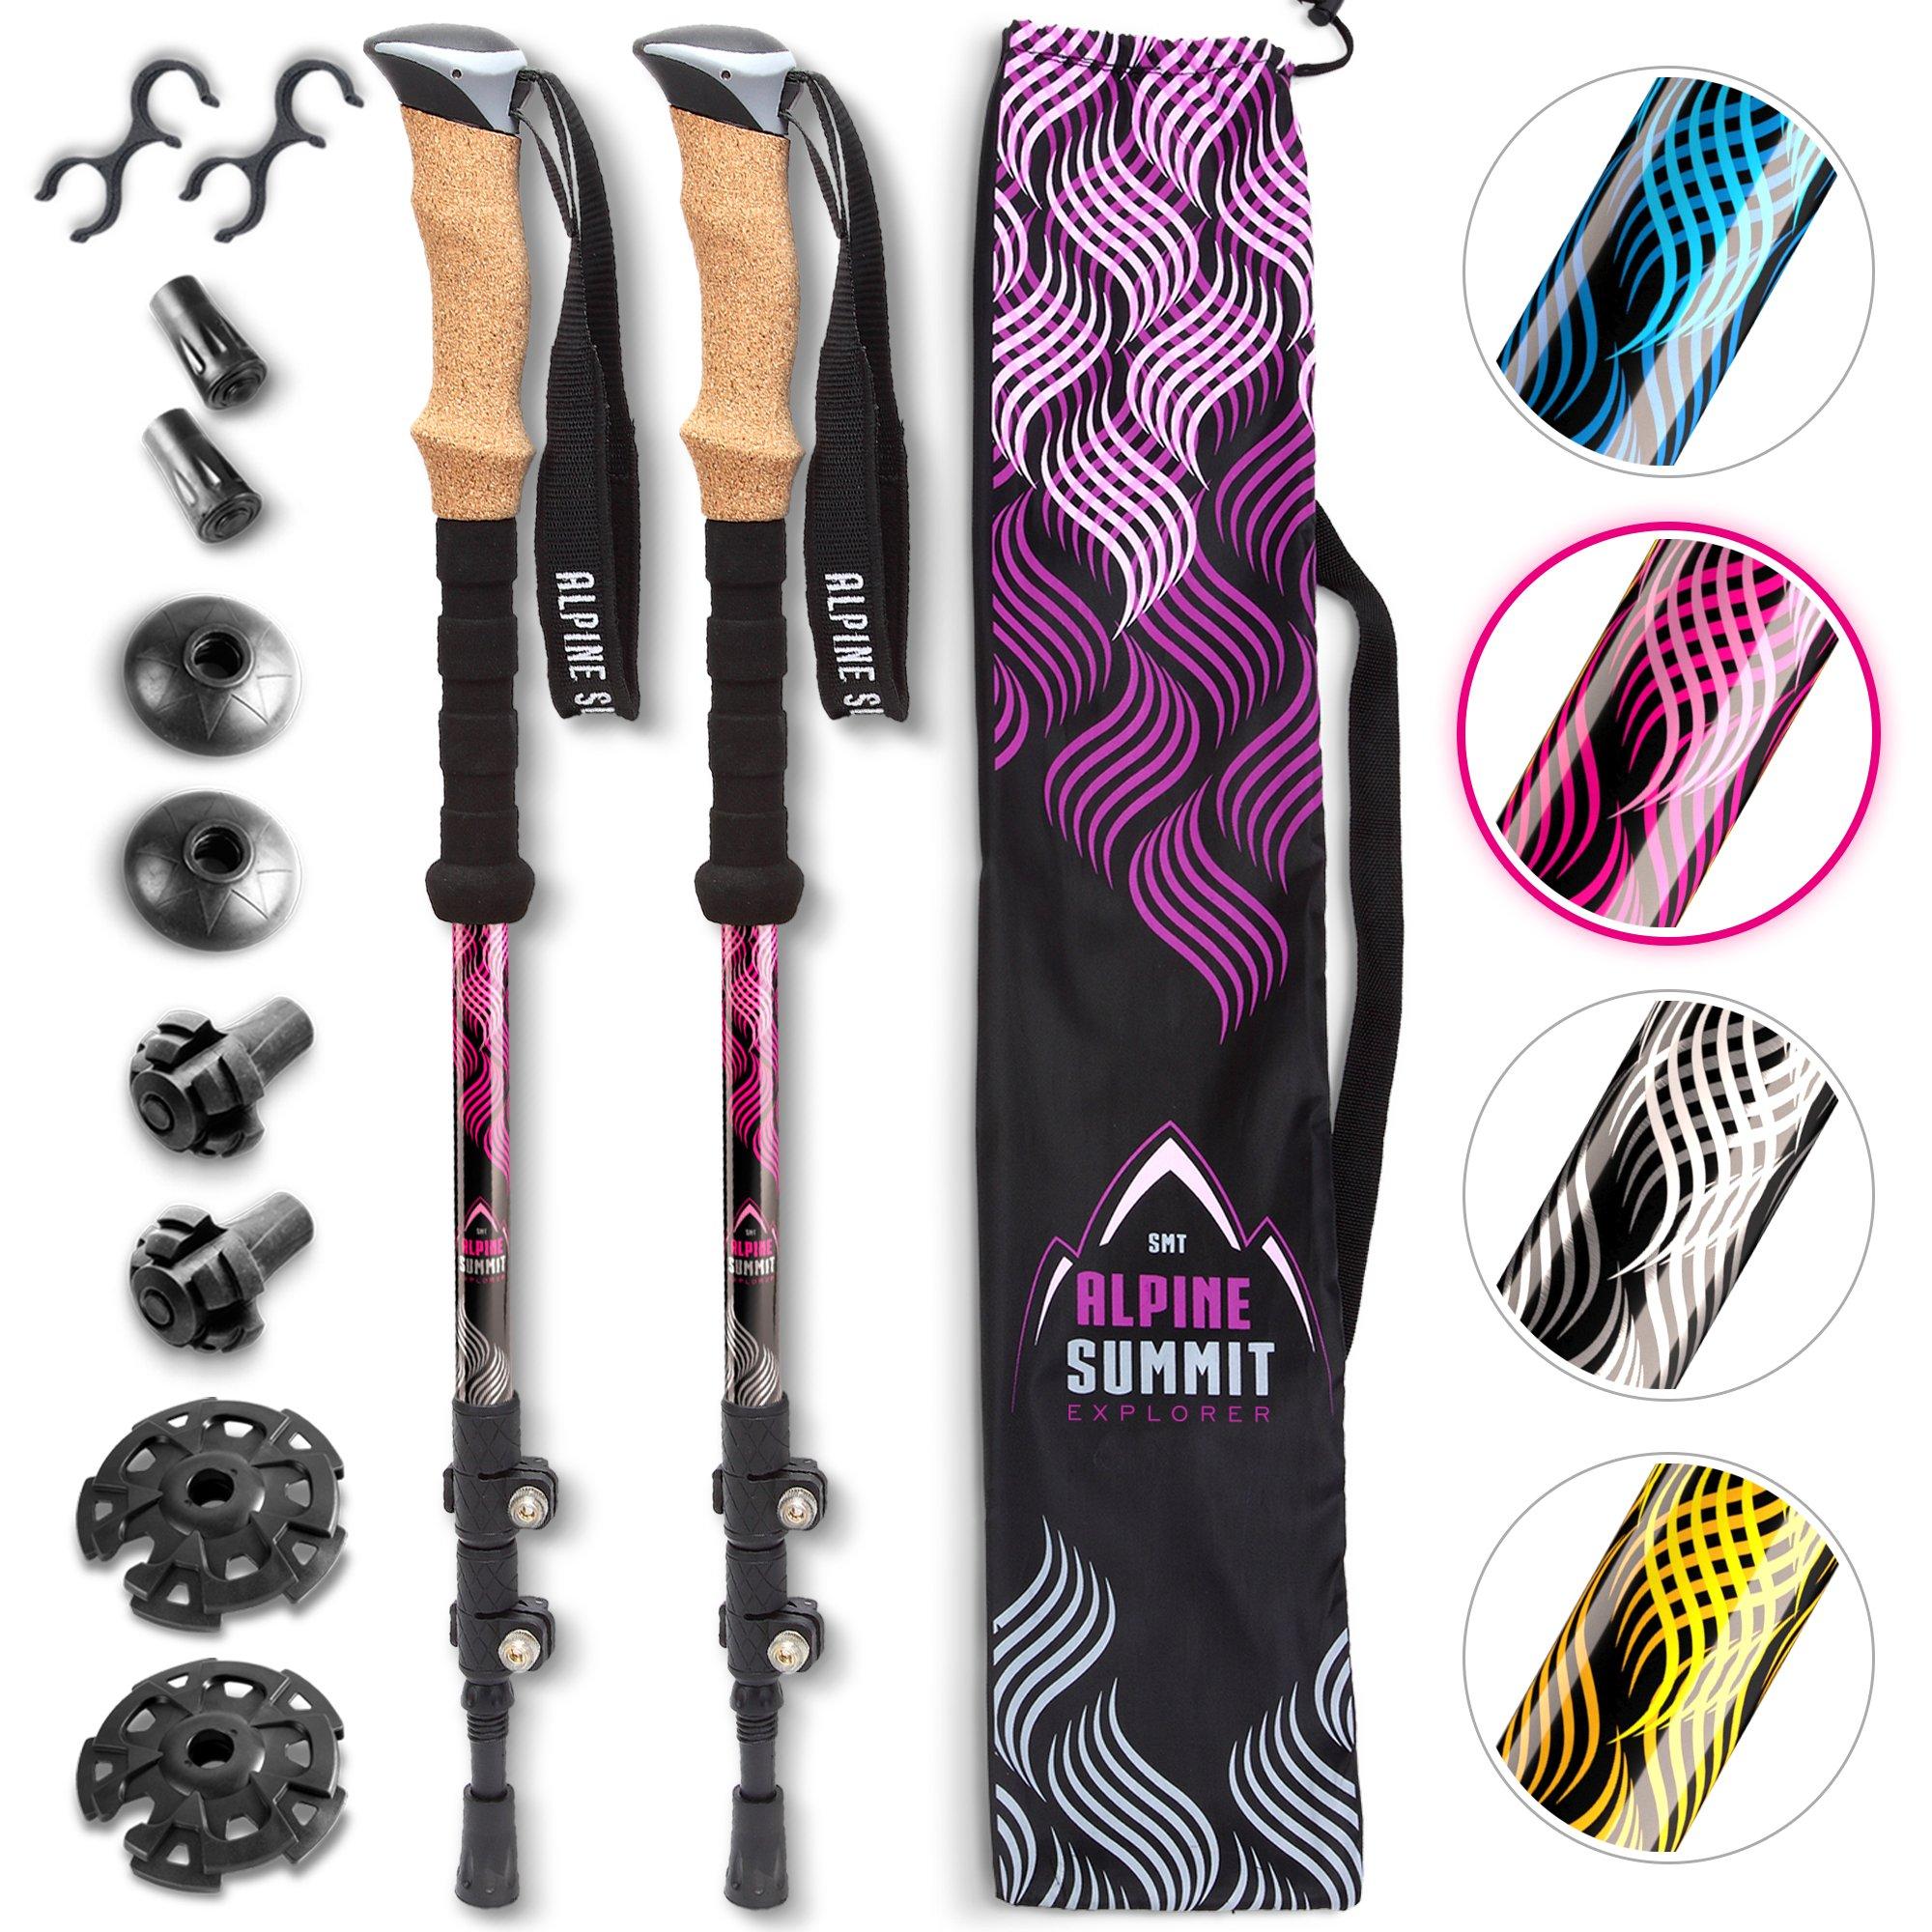 Premium Aluminum Hiking/Trekking Poles with Anti-Shock Tips, Walking Sticks with Cork Grips - Enjoy Pole Trekking in The Great Outdoors